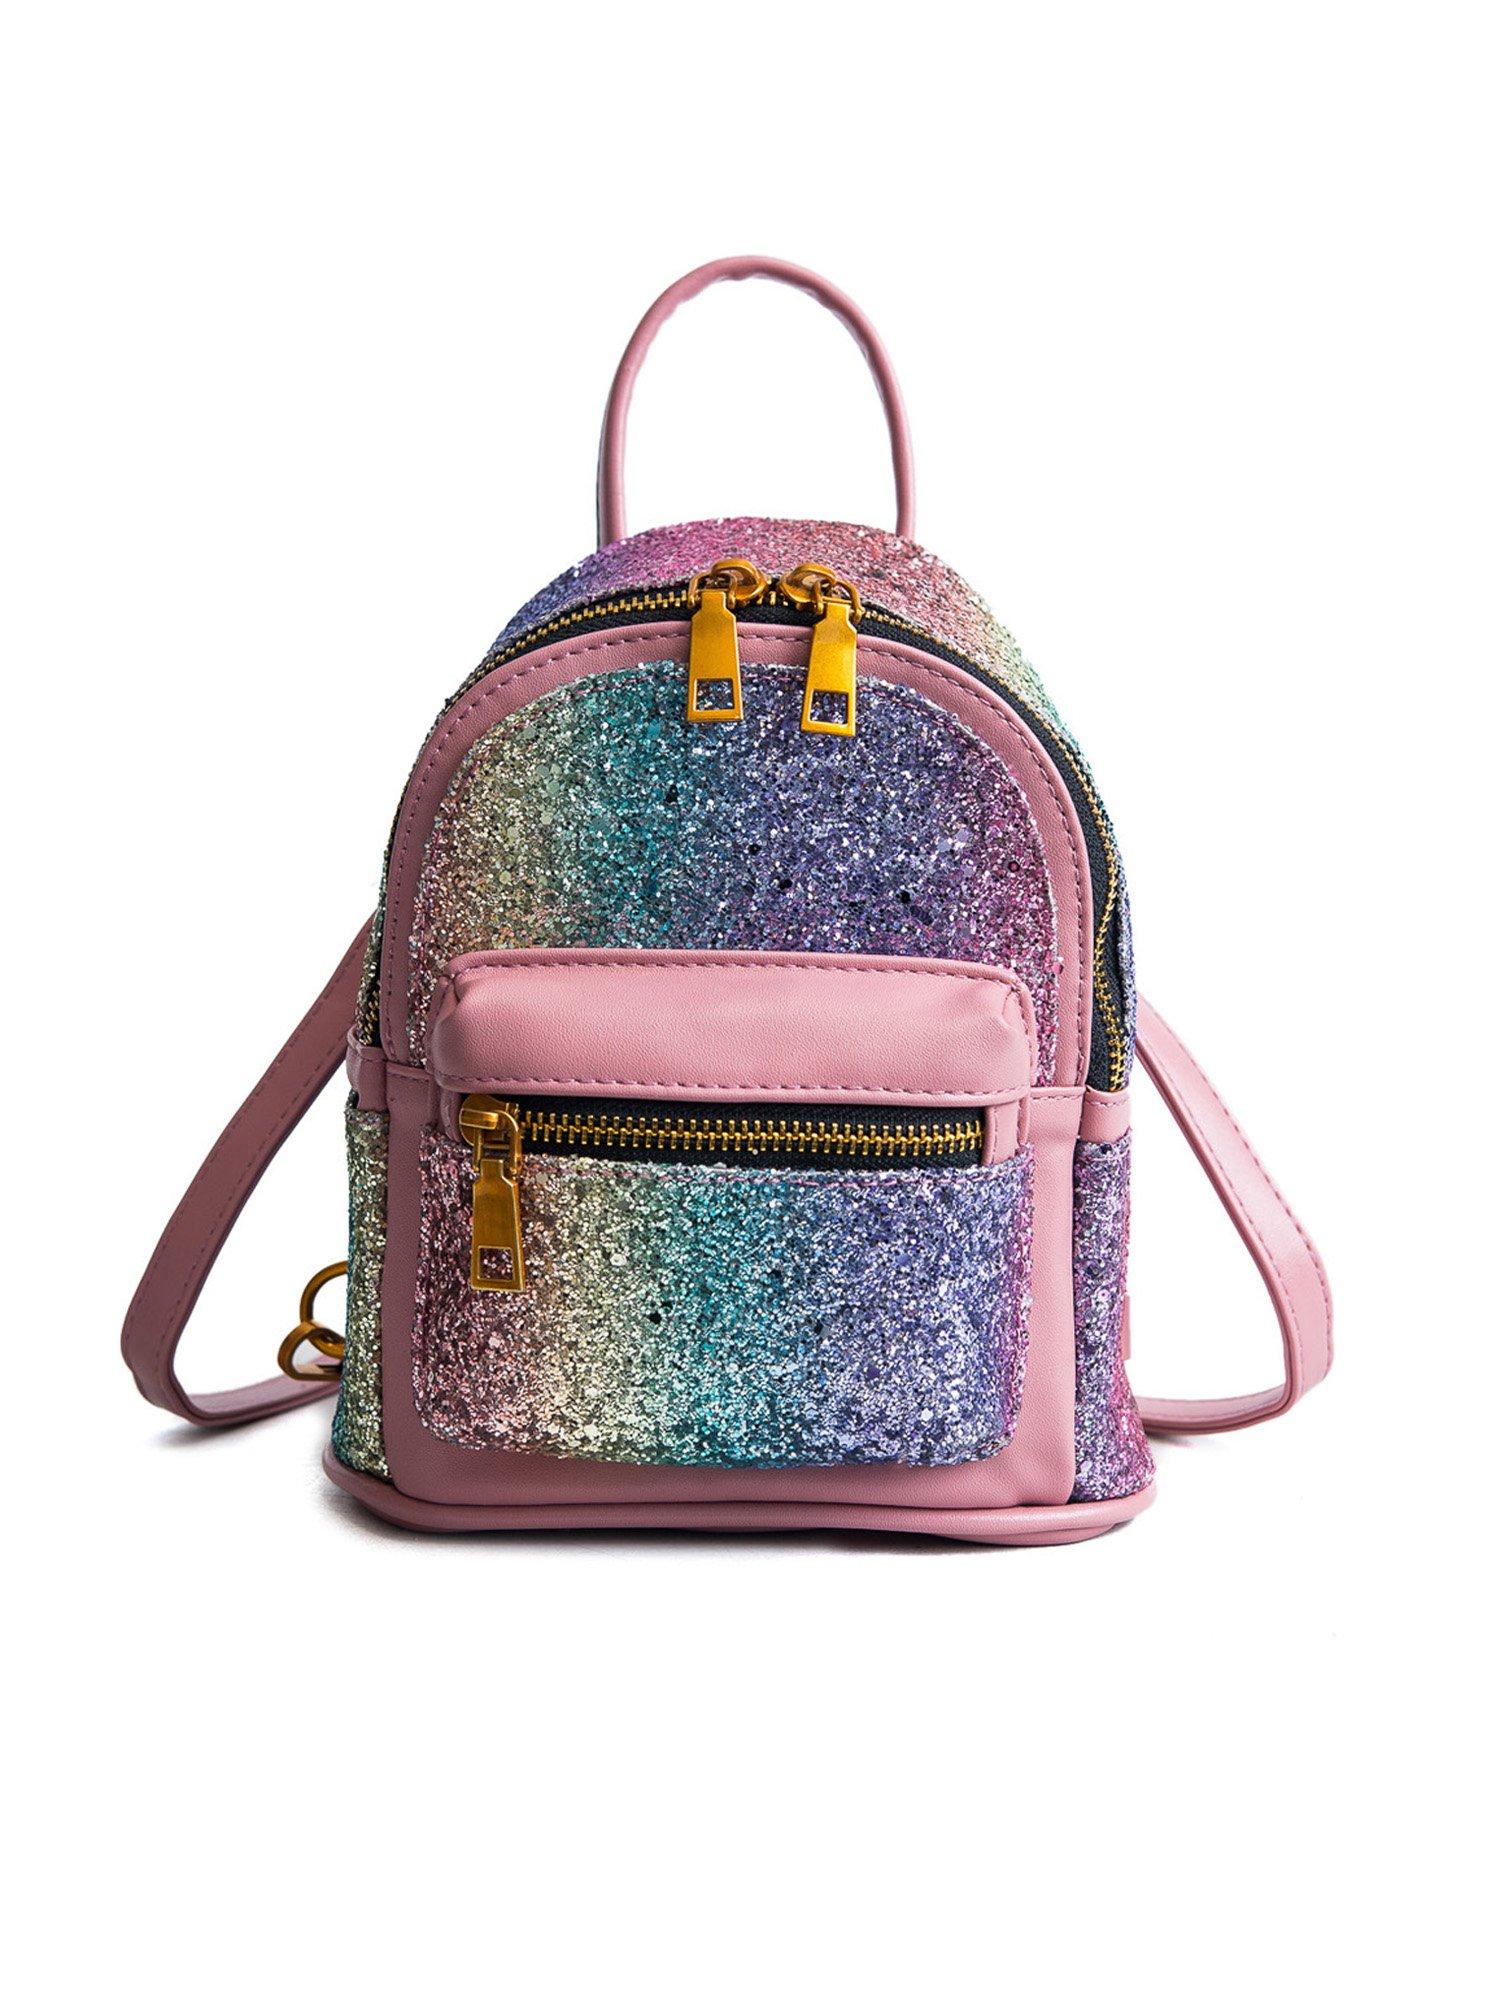 EPLAZA Women Girls Shining Backpack Convertible Shoulder Cross Purse Child Travel Bag Daypack (gradient pink)